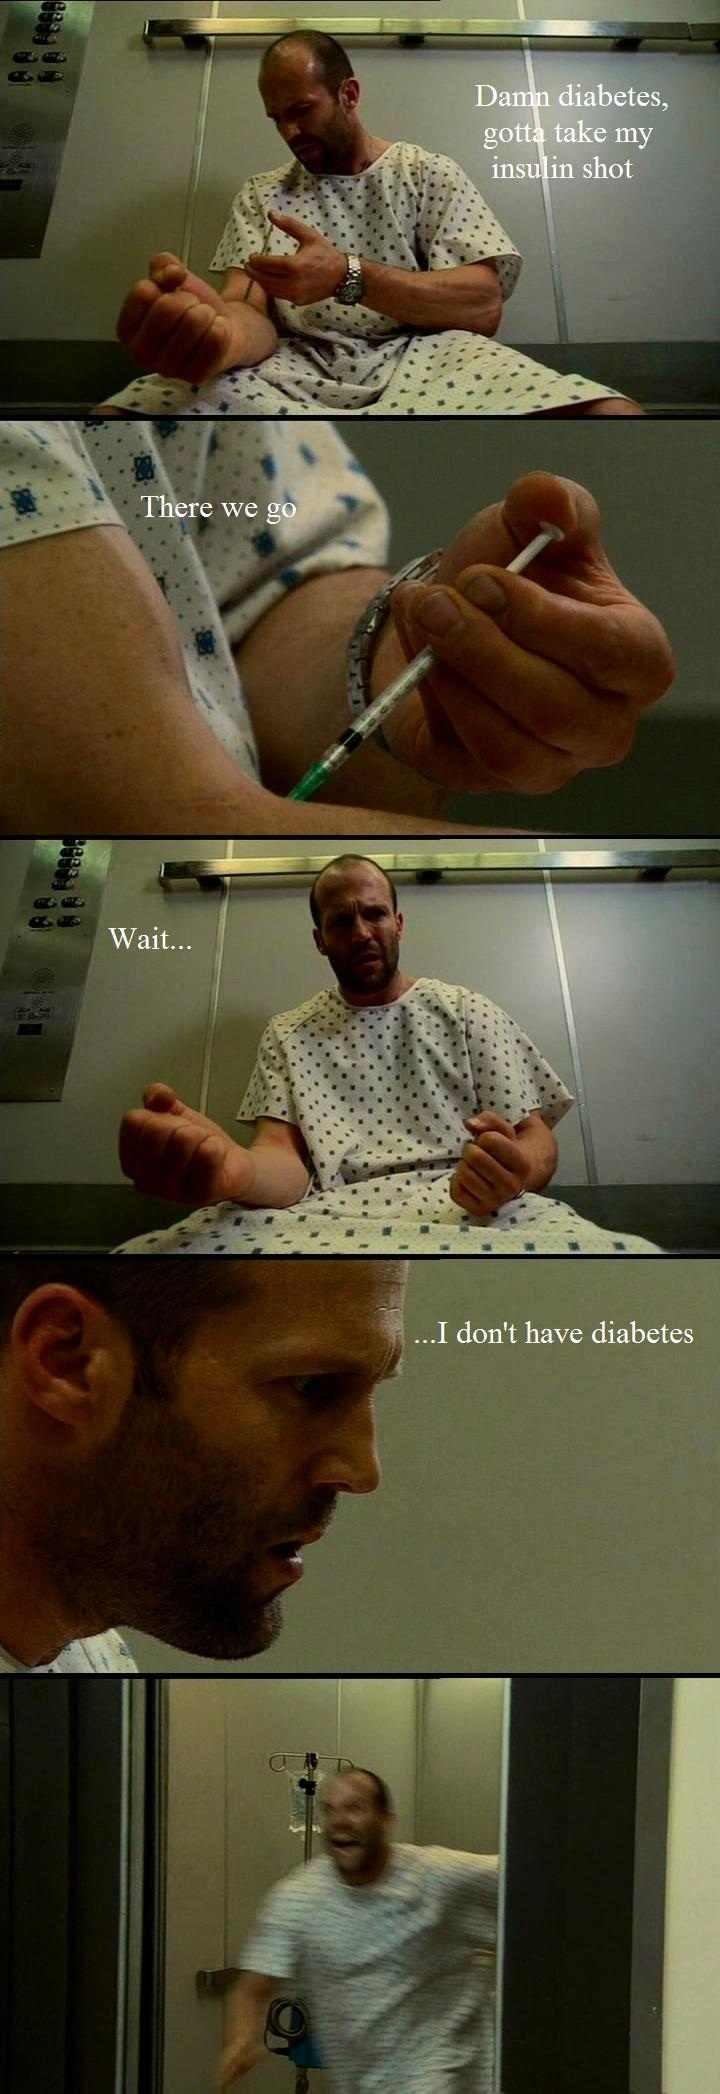 Diabeetus. Chocolate's 'n' . Diabeetus Chocolate's 'n'